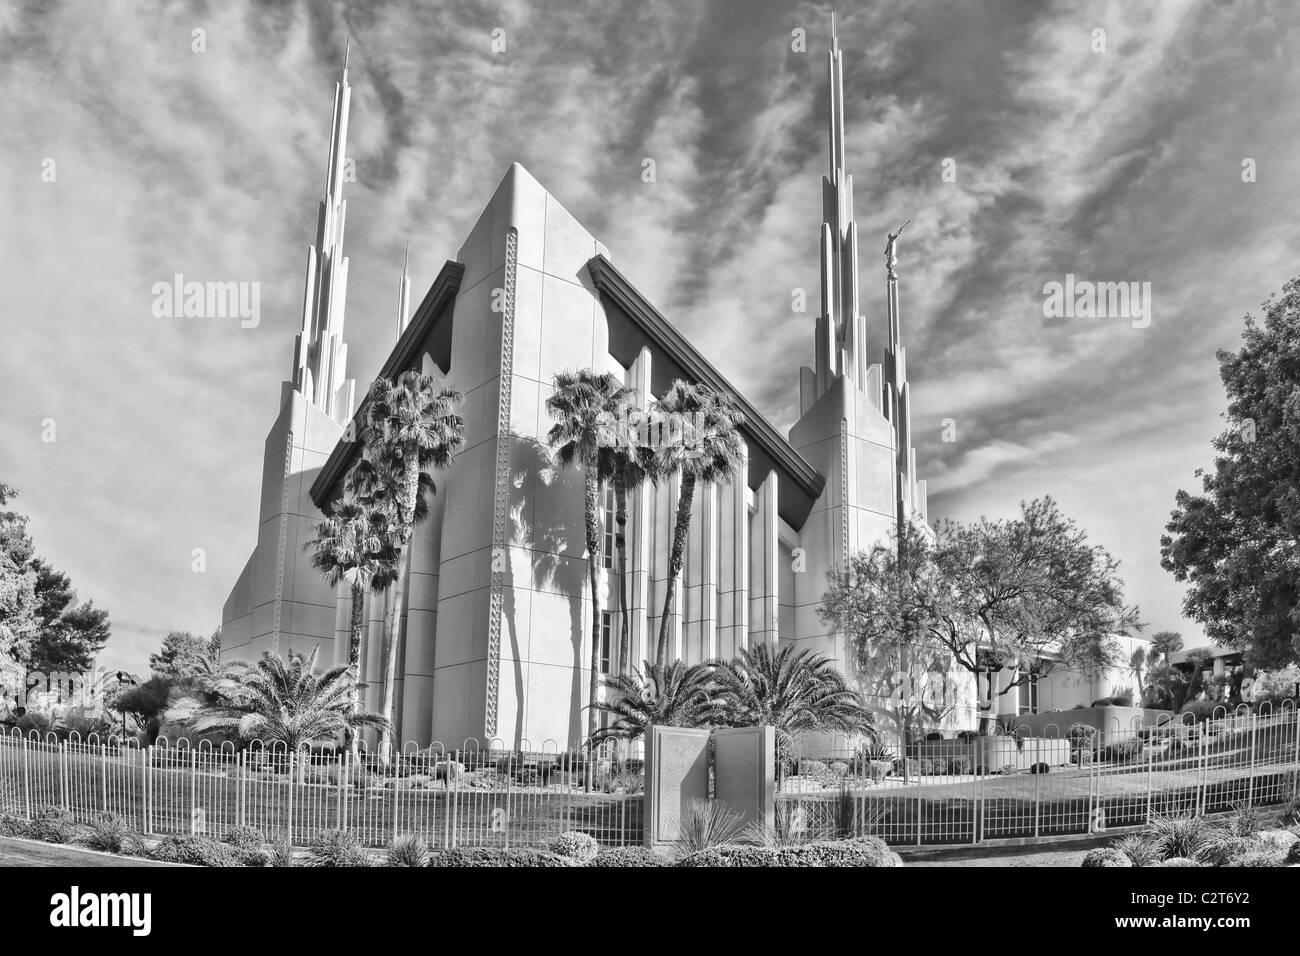 Mormon Lds Temple In Las Vegas Nevada Clouds Moving Across Sky Stock Photo Alamy